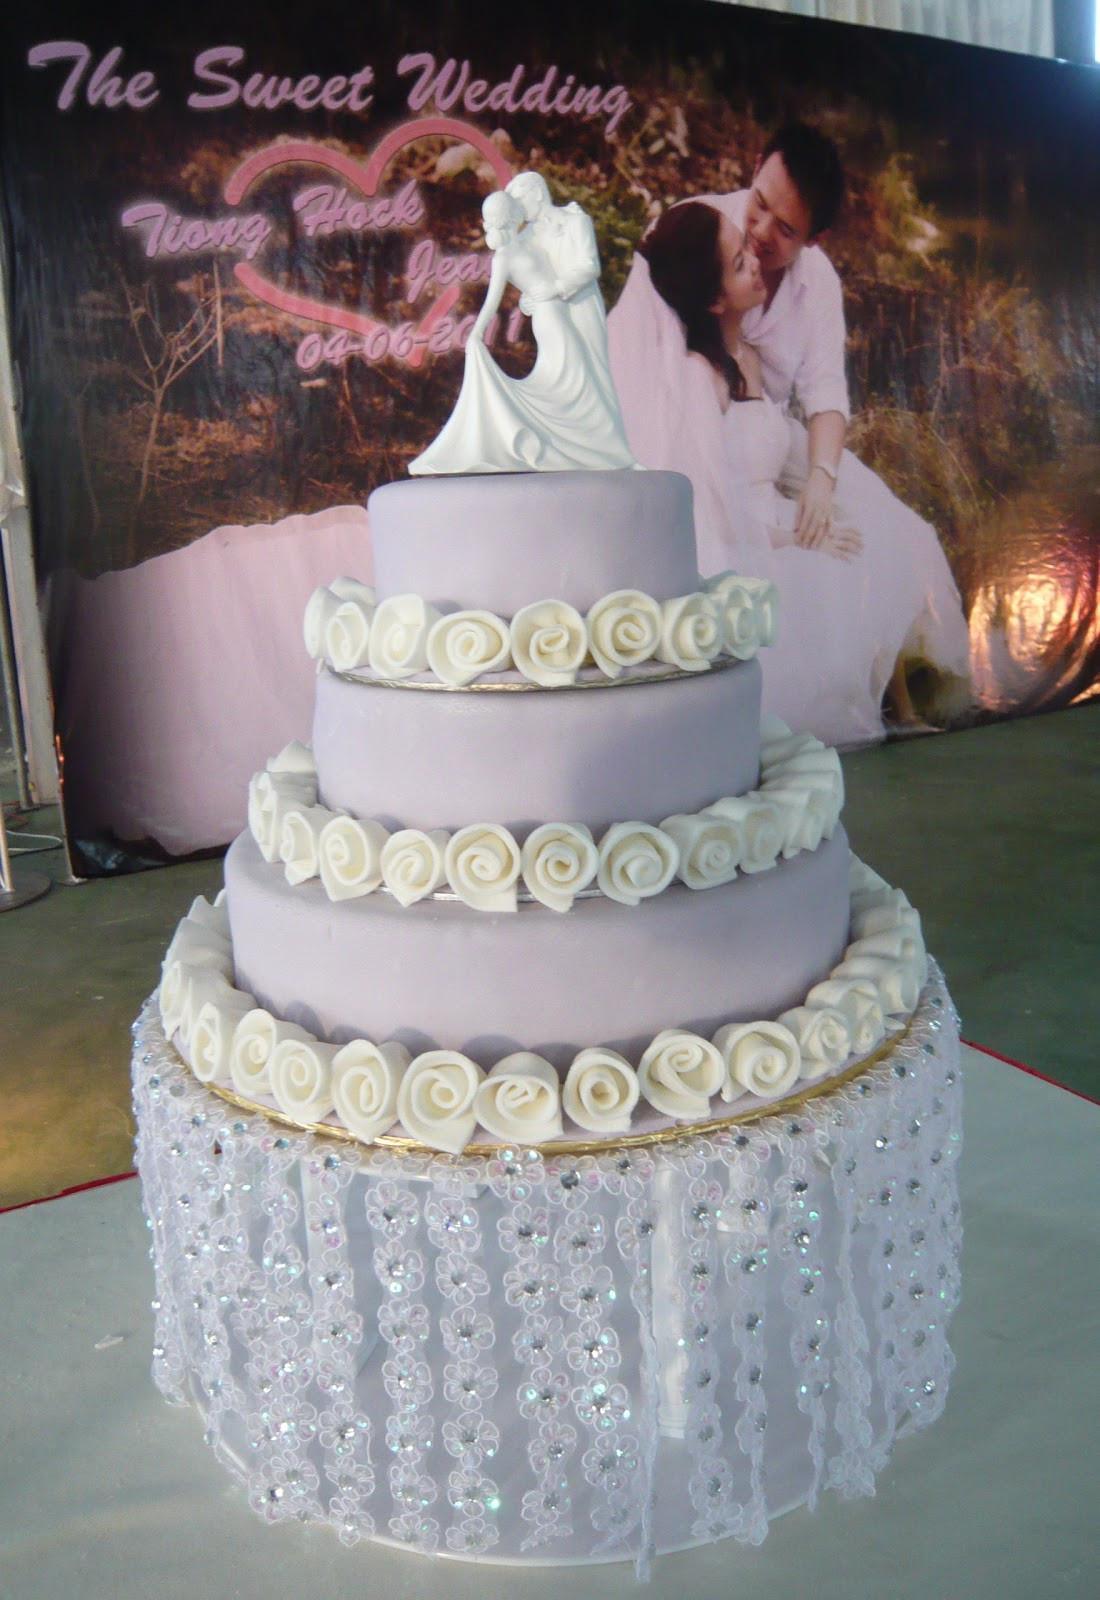 Waterfall Wedding Cakes  Jenn Cupcakes & Muffins Waterfall Wedding cake